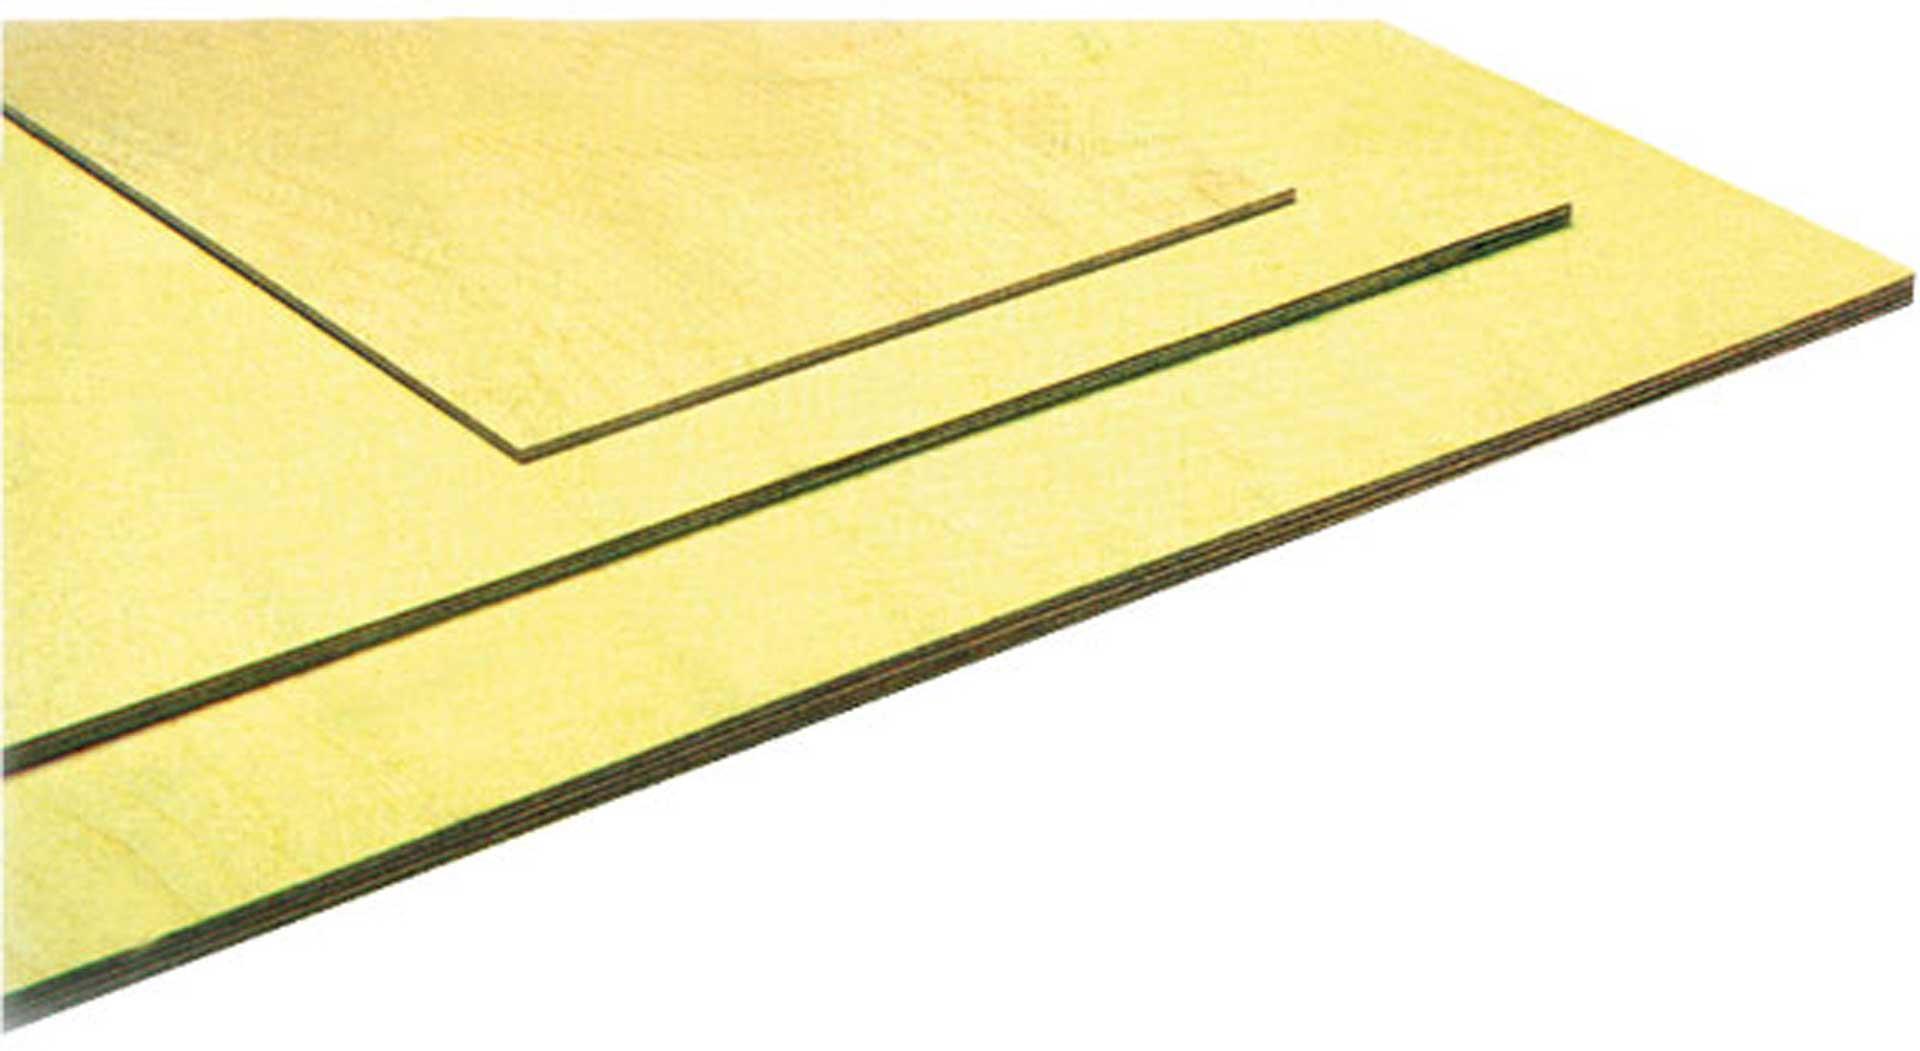 MODELLBAU LINDINGER BIRCH-SPERRY 0,6/300/500MM